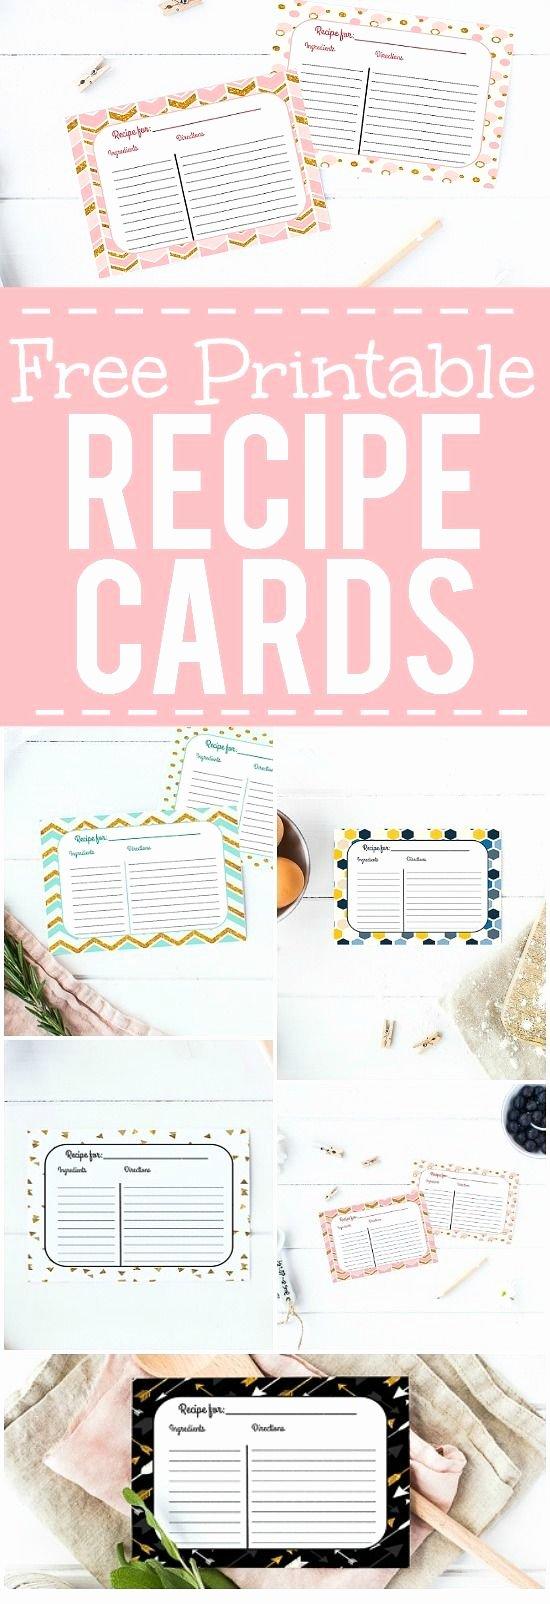 Recipe Template Google Docs Elegant Card Recipe Card Template Picture Recipe Card Template